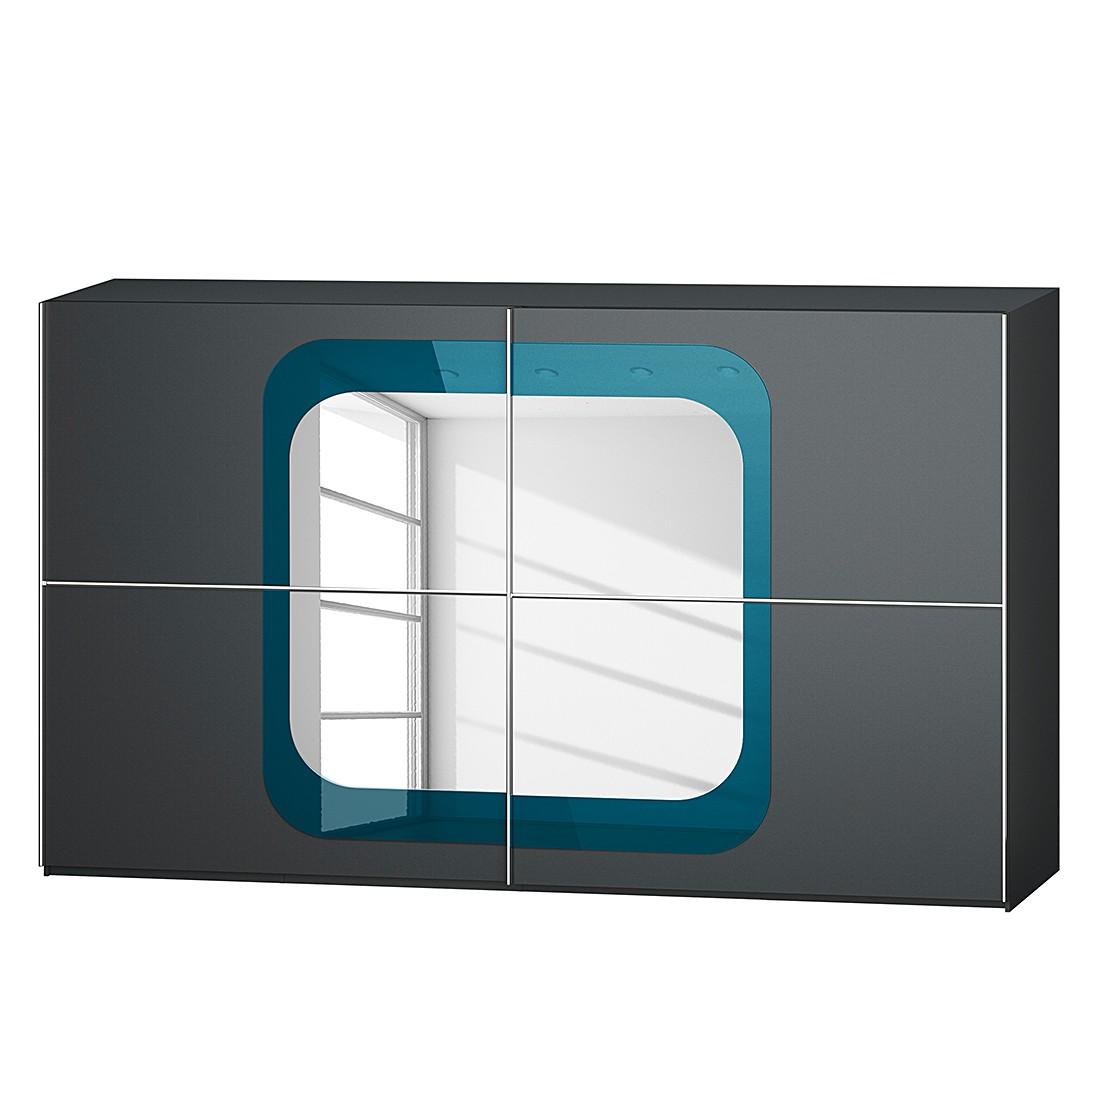 Schuifdeurkast Lumos - Grafietkleurig/petrolblauw - 359cm (2-deurs) - 236cm, Rauch Dialog